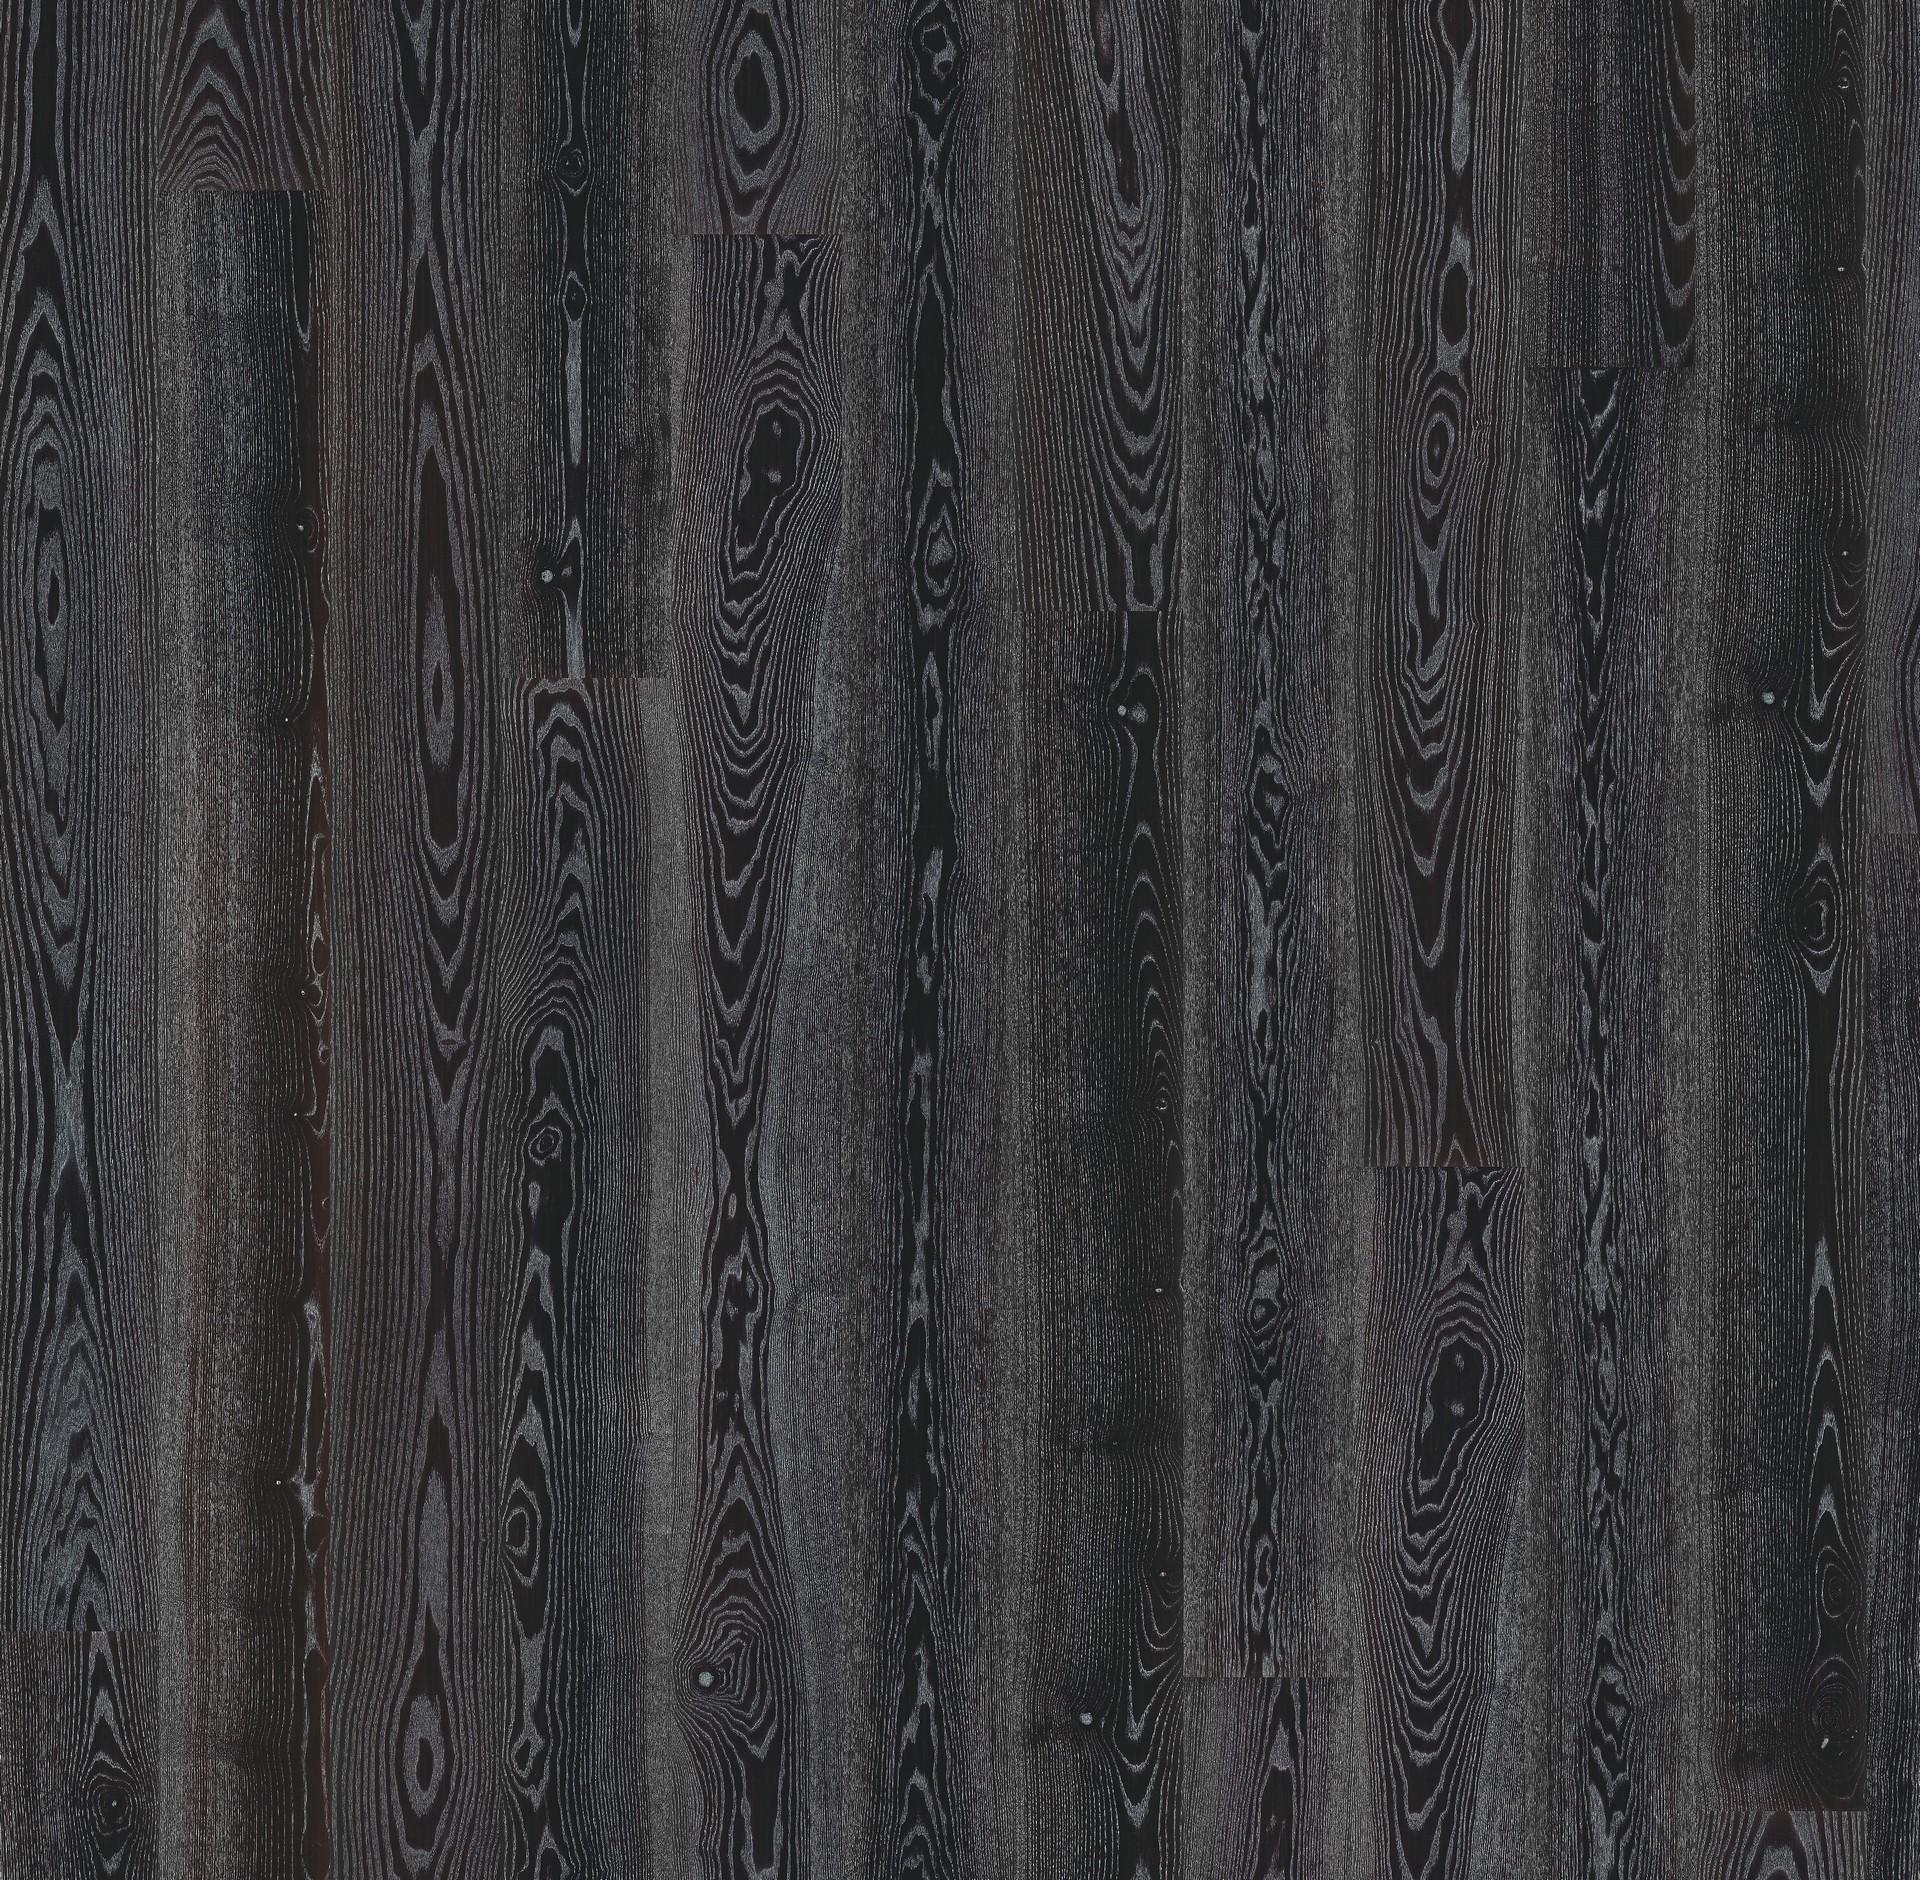 Saarni Black Silver